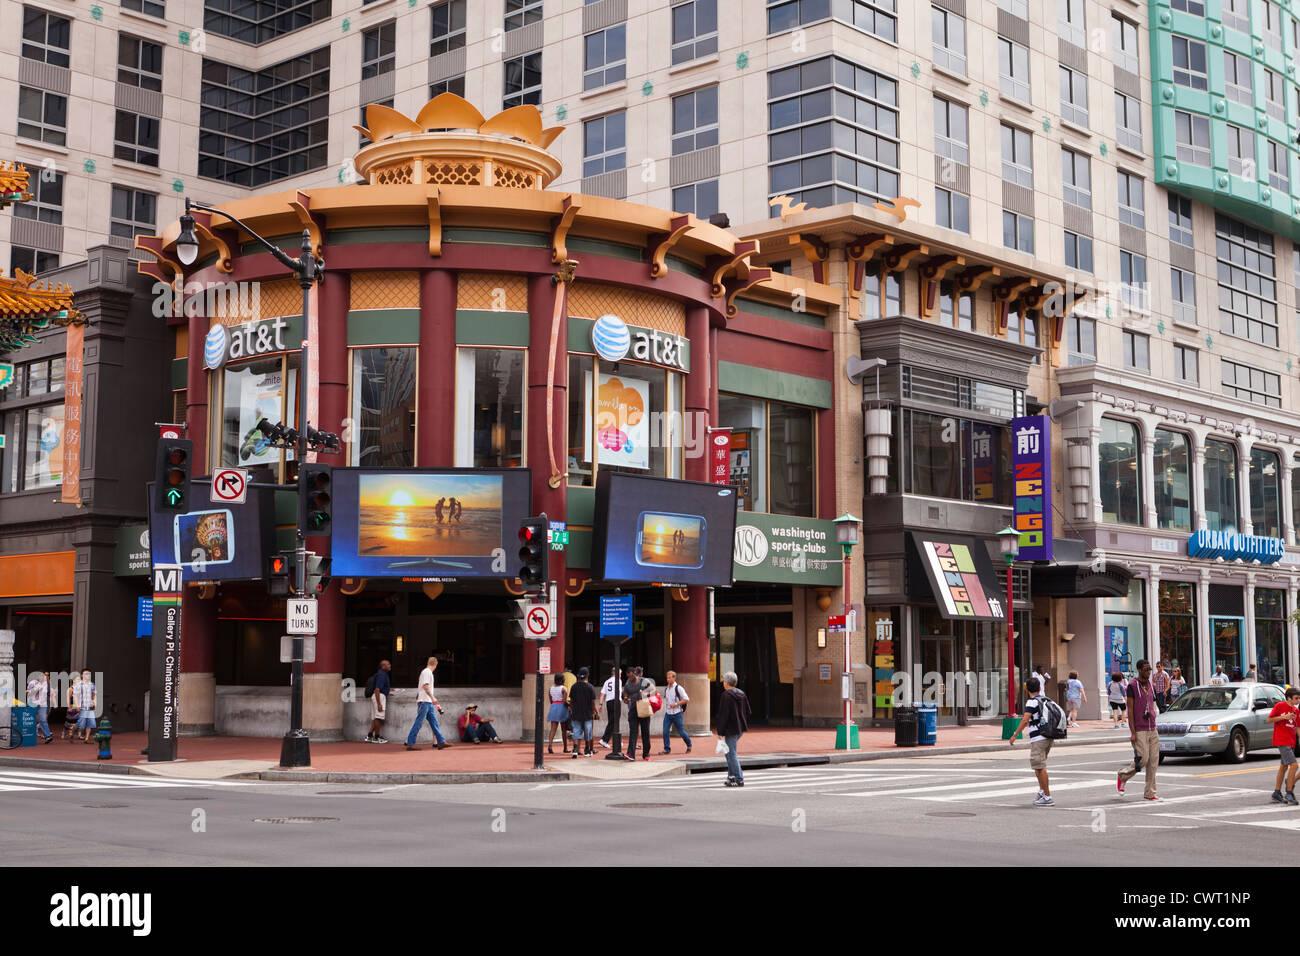 China Town - Washington, DC USA Stock Photo